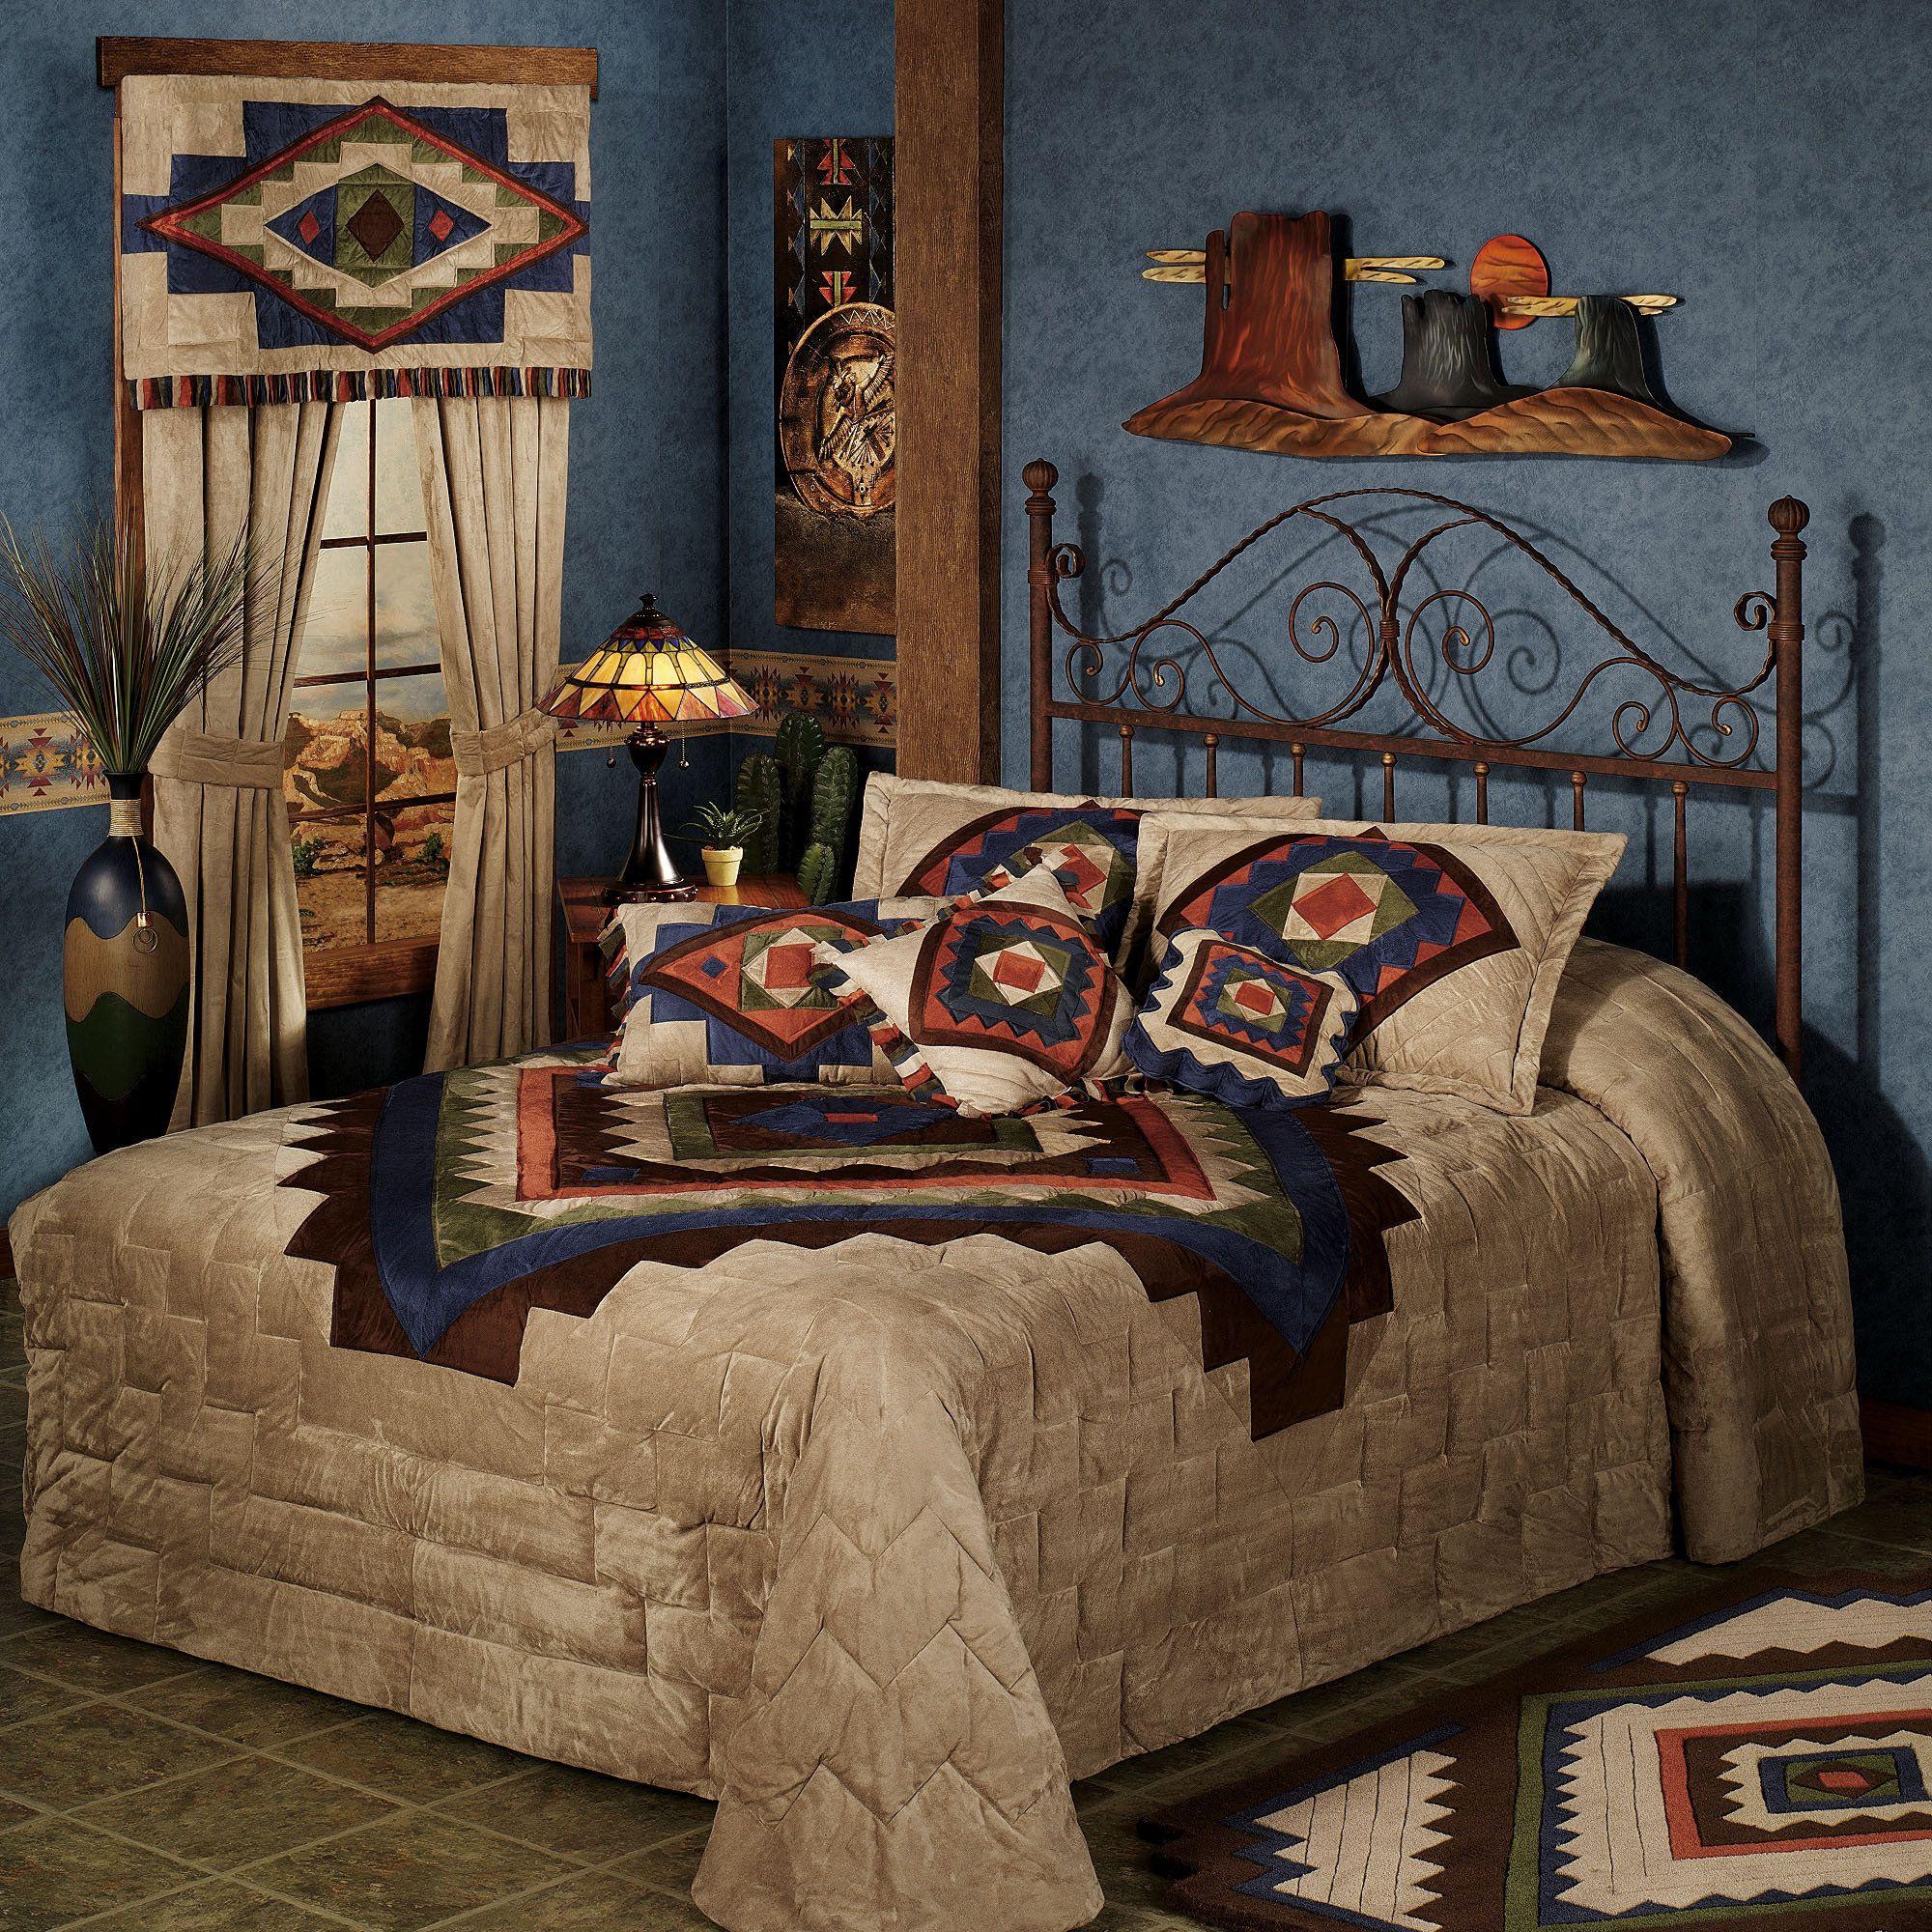 Southwestern furniture and decor aspen country - Interior furniture warehouse buffalo ny ...